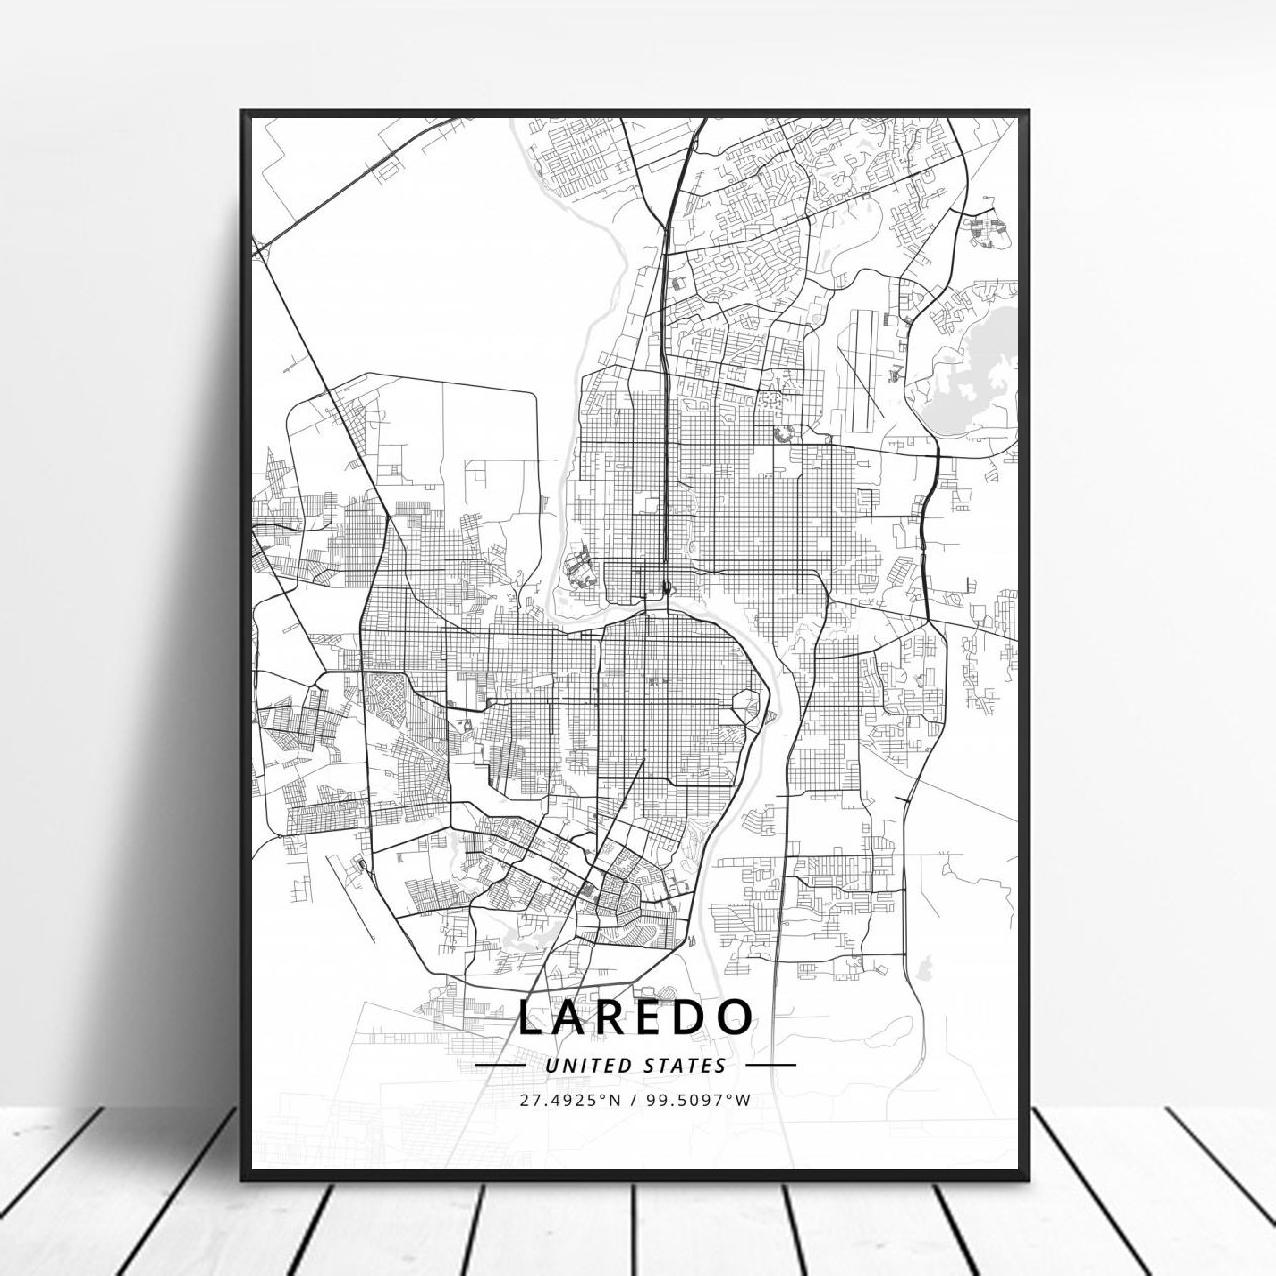 Póster Artístico de lienzo Durham Colorado Spring, fuerte Worth, Laredo, New York, Scottsdale, Estados Unidos, Mapa